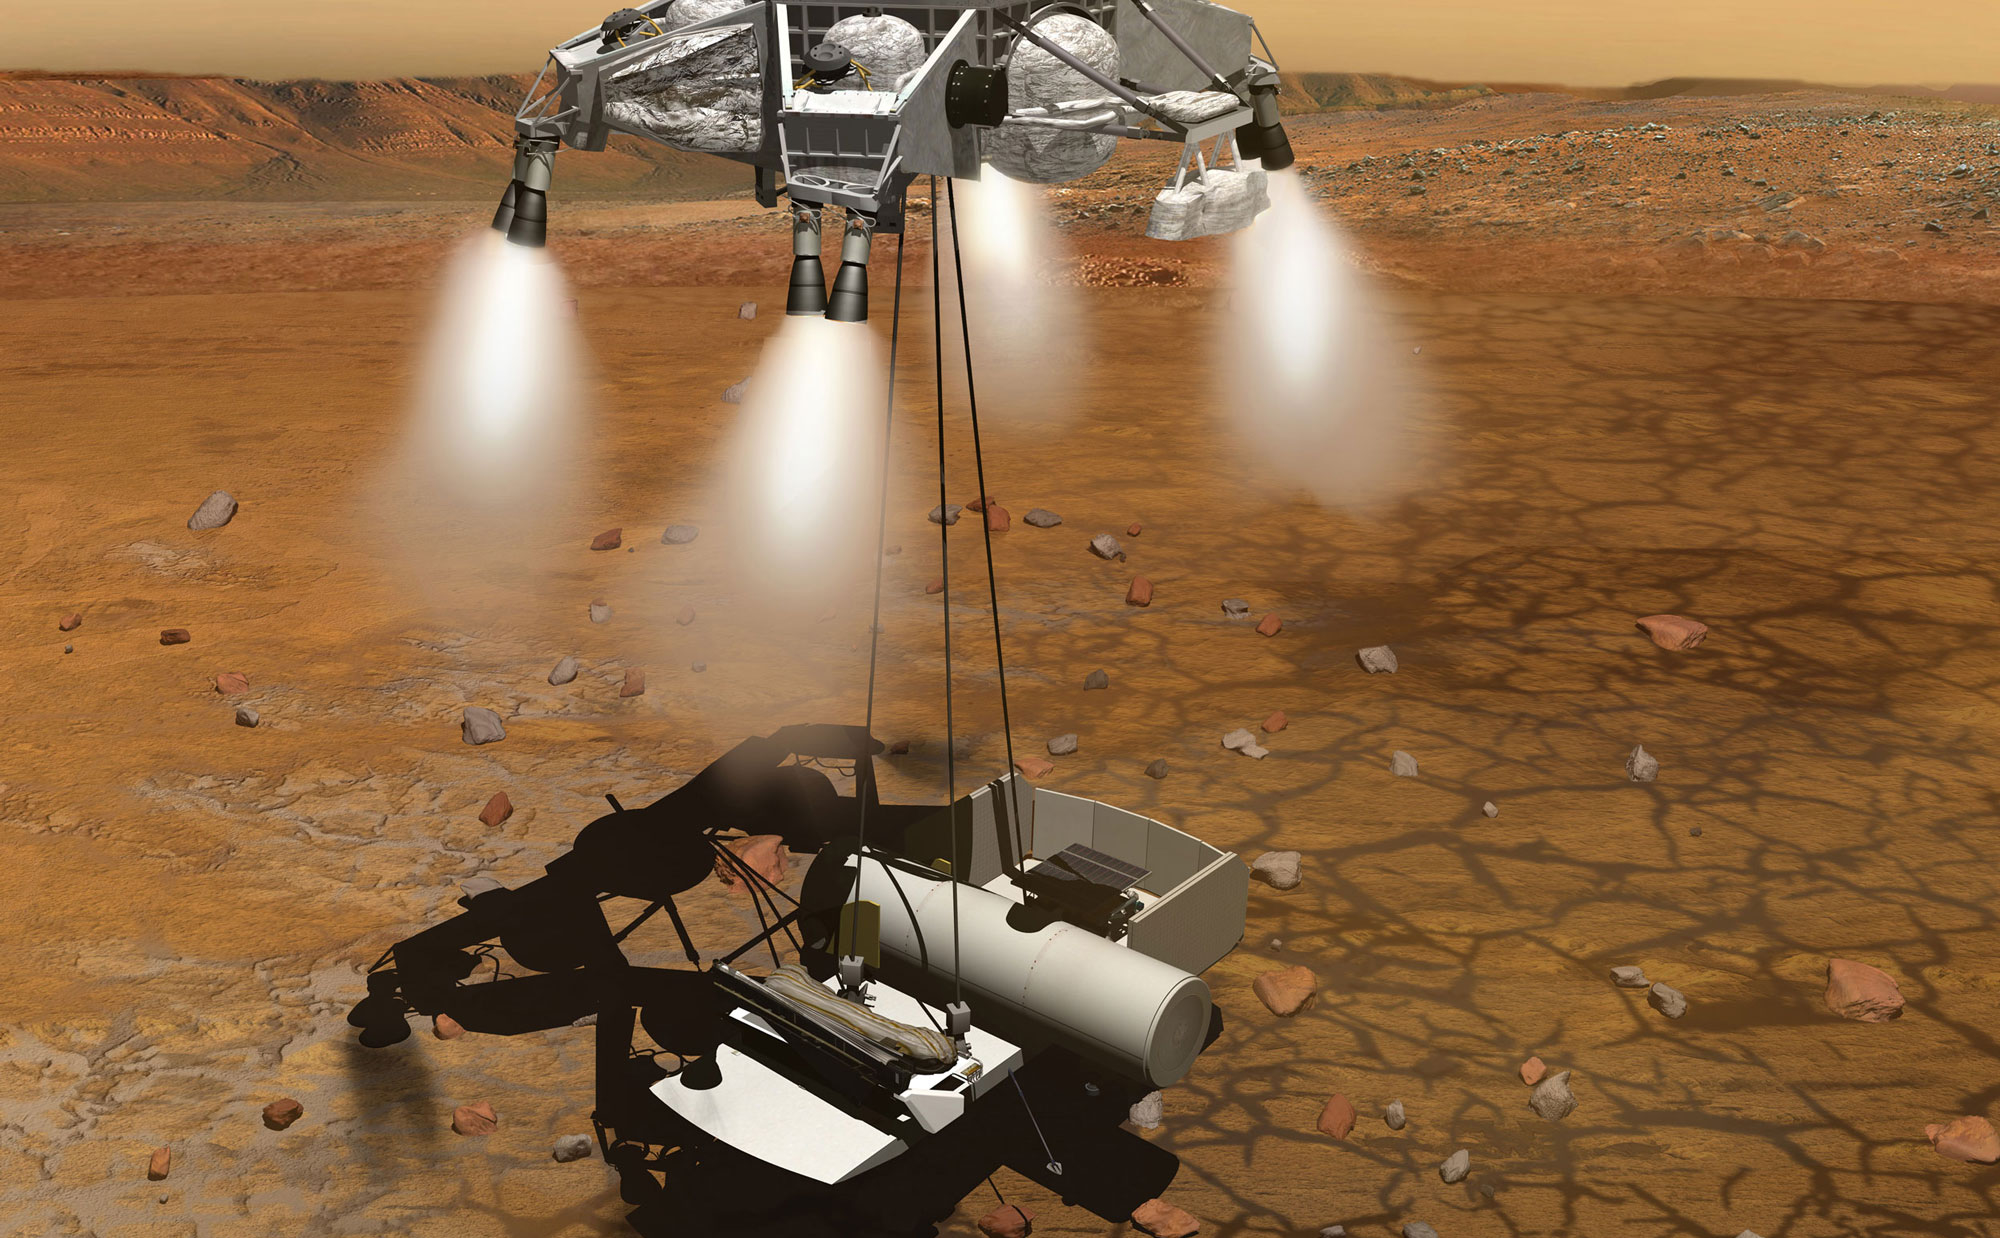 nasa curiosity landing - HD2000×1238